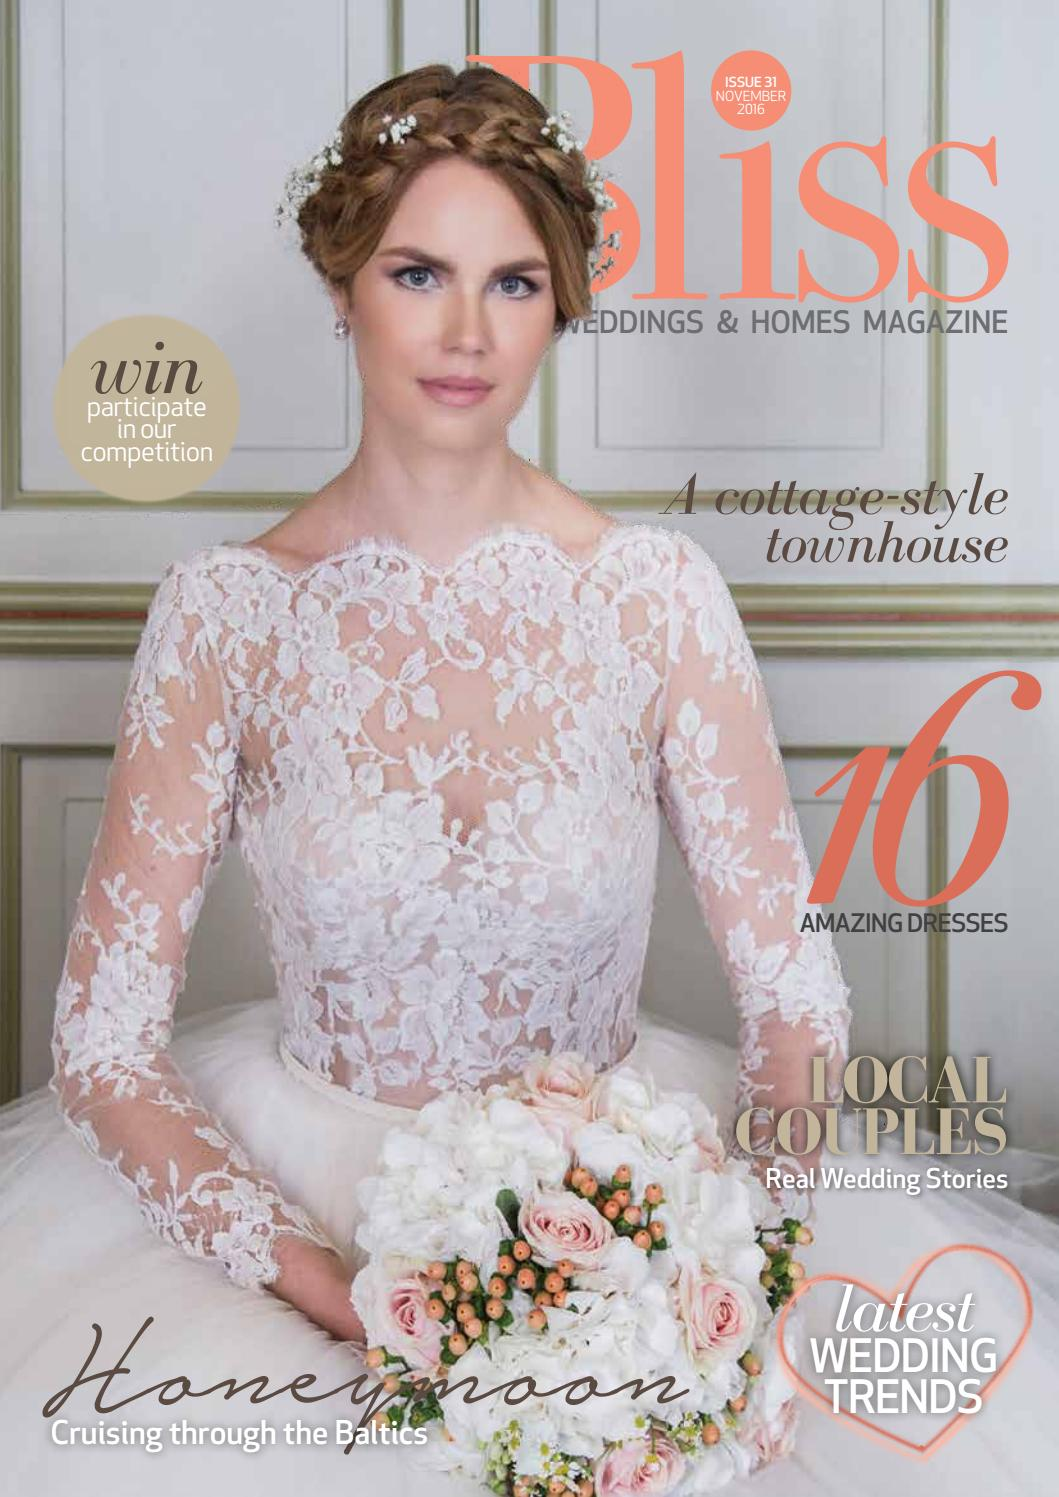 e335b38c16e Bliss Weddings & Homes November 2016 by Content House Group - issuu